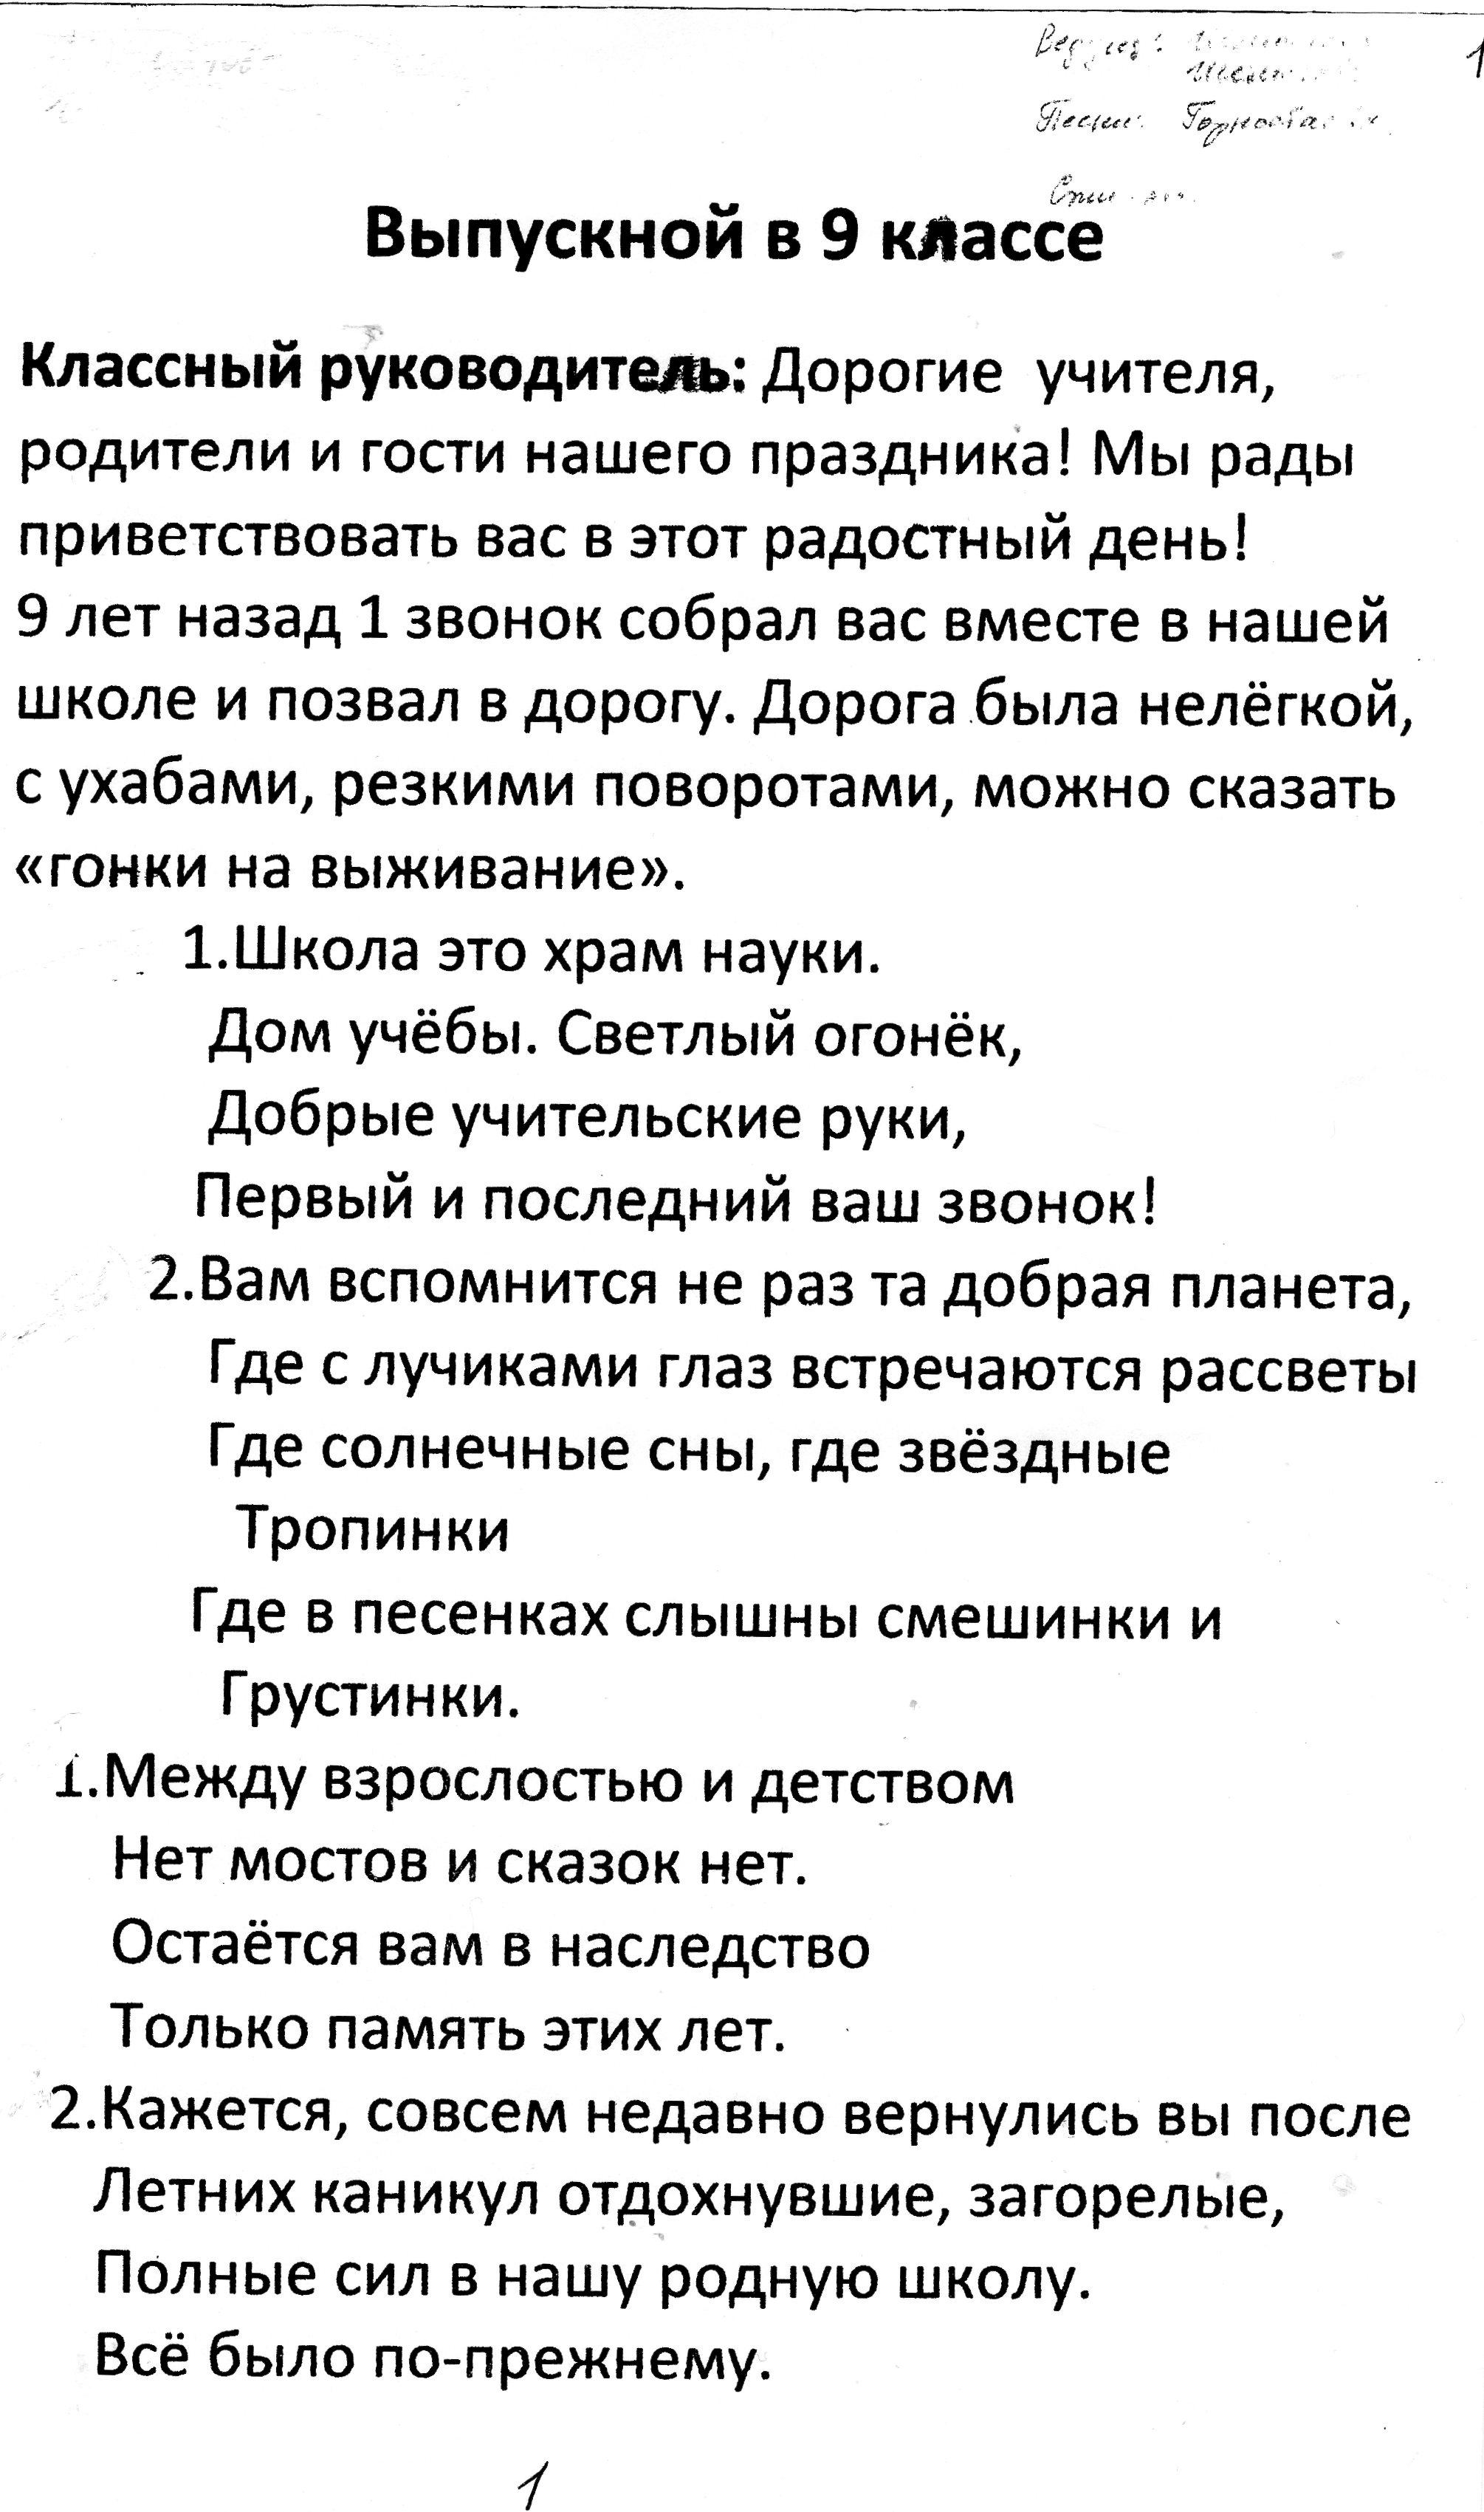 C:\Documents and Settings\ADMIN\Мои документы\9 кл выпускной\img007.jpg